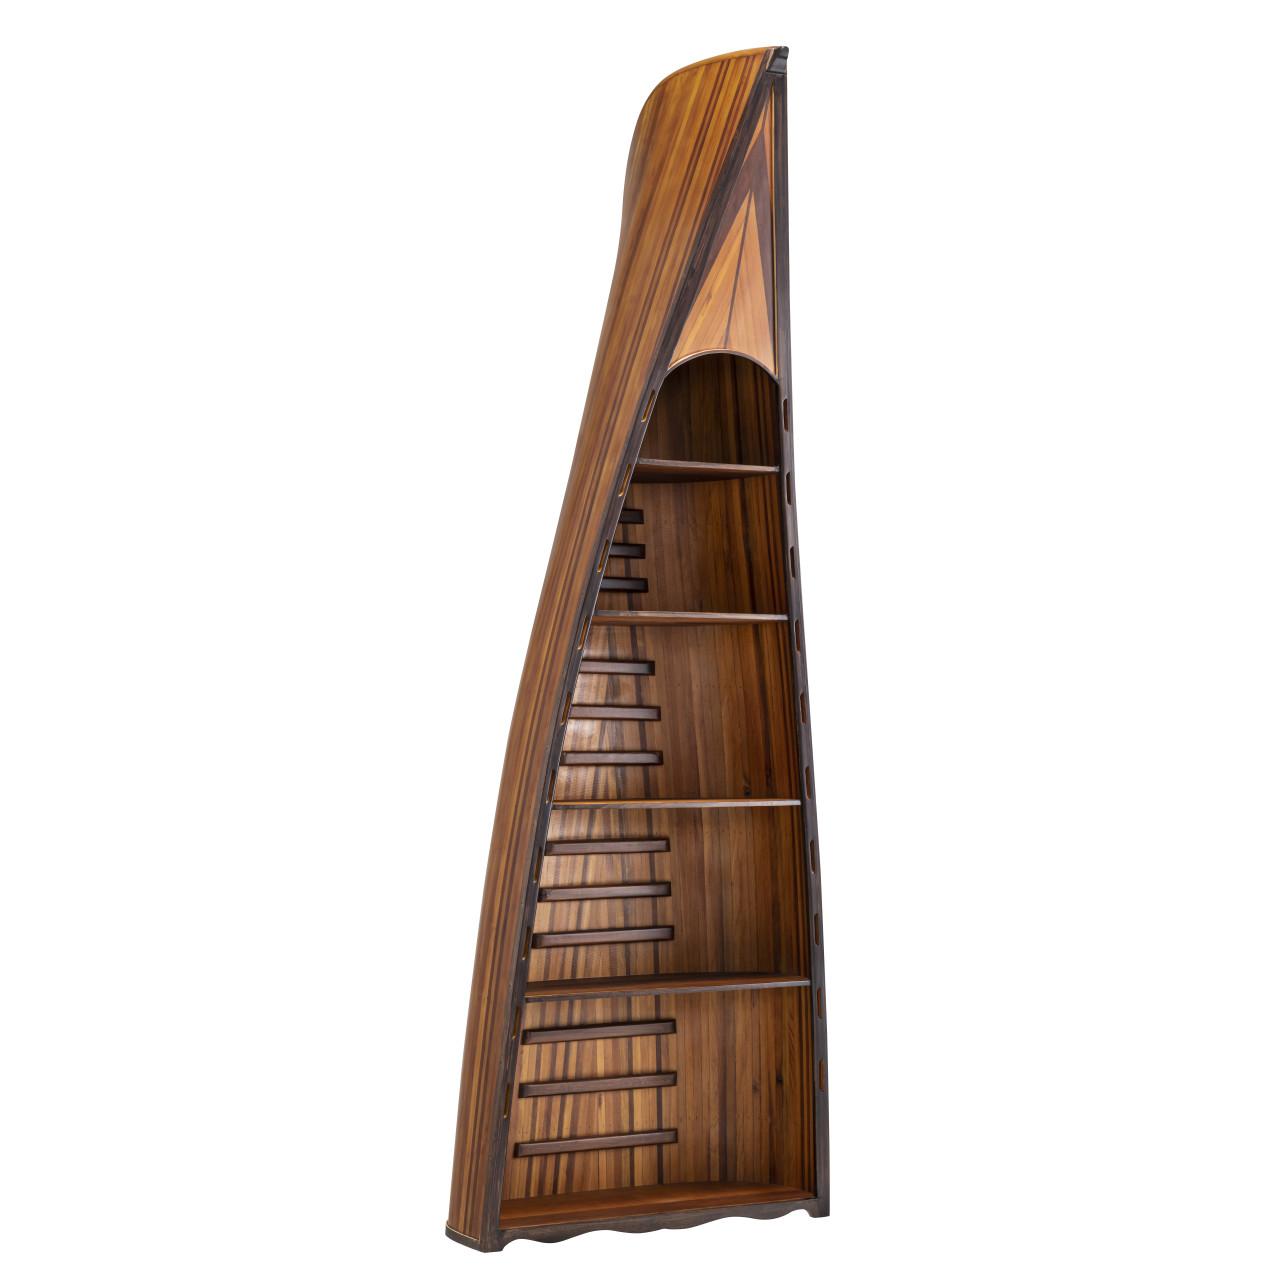 Canoe Bookcase Book Shelf Cedar Wood Strip Built